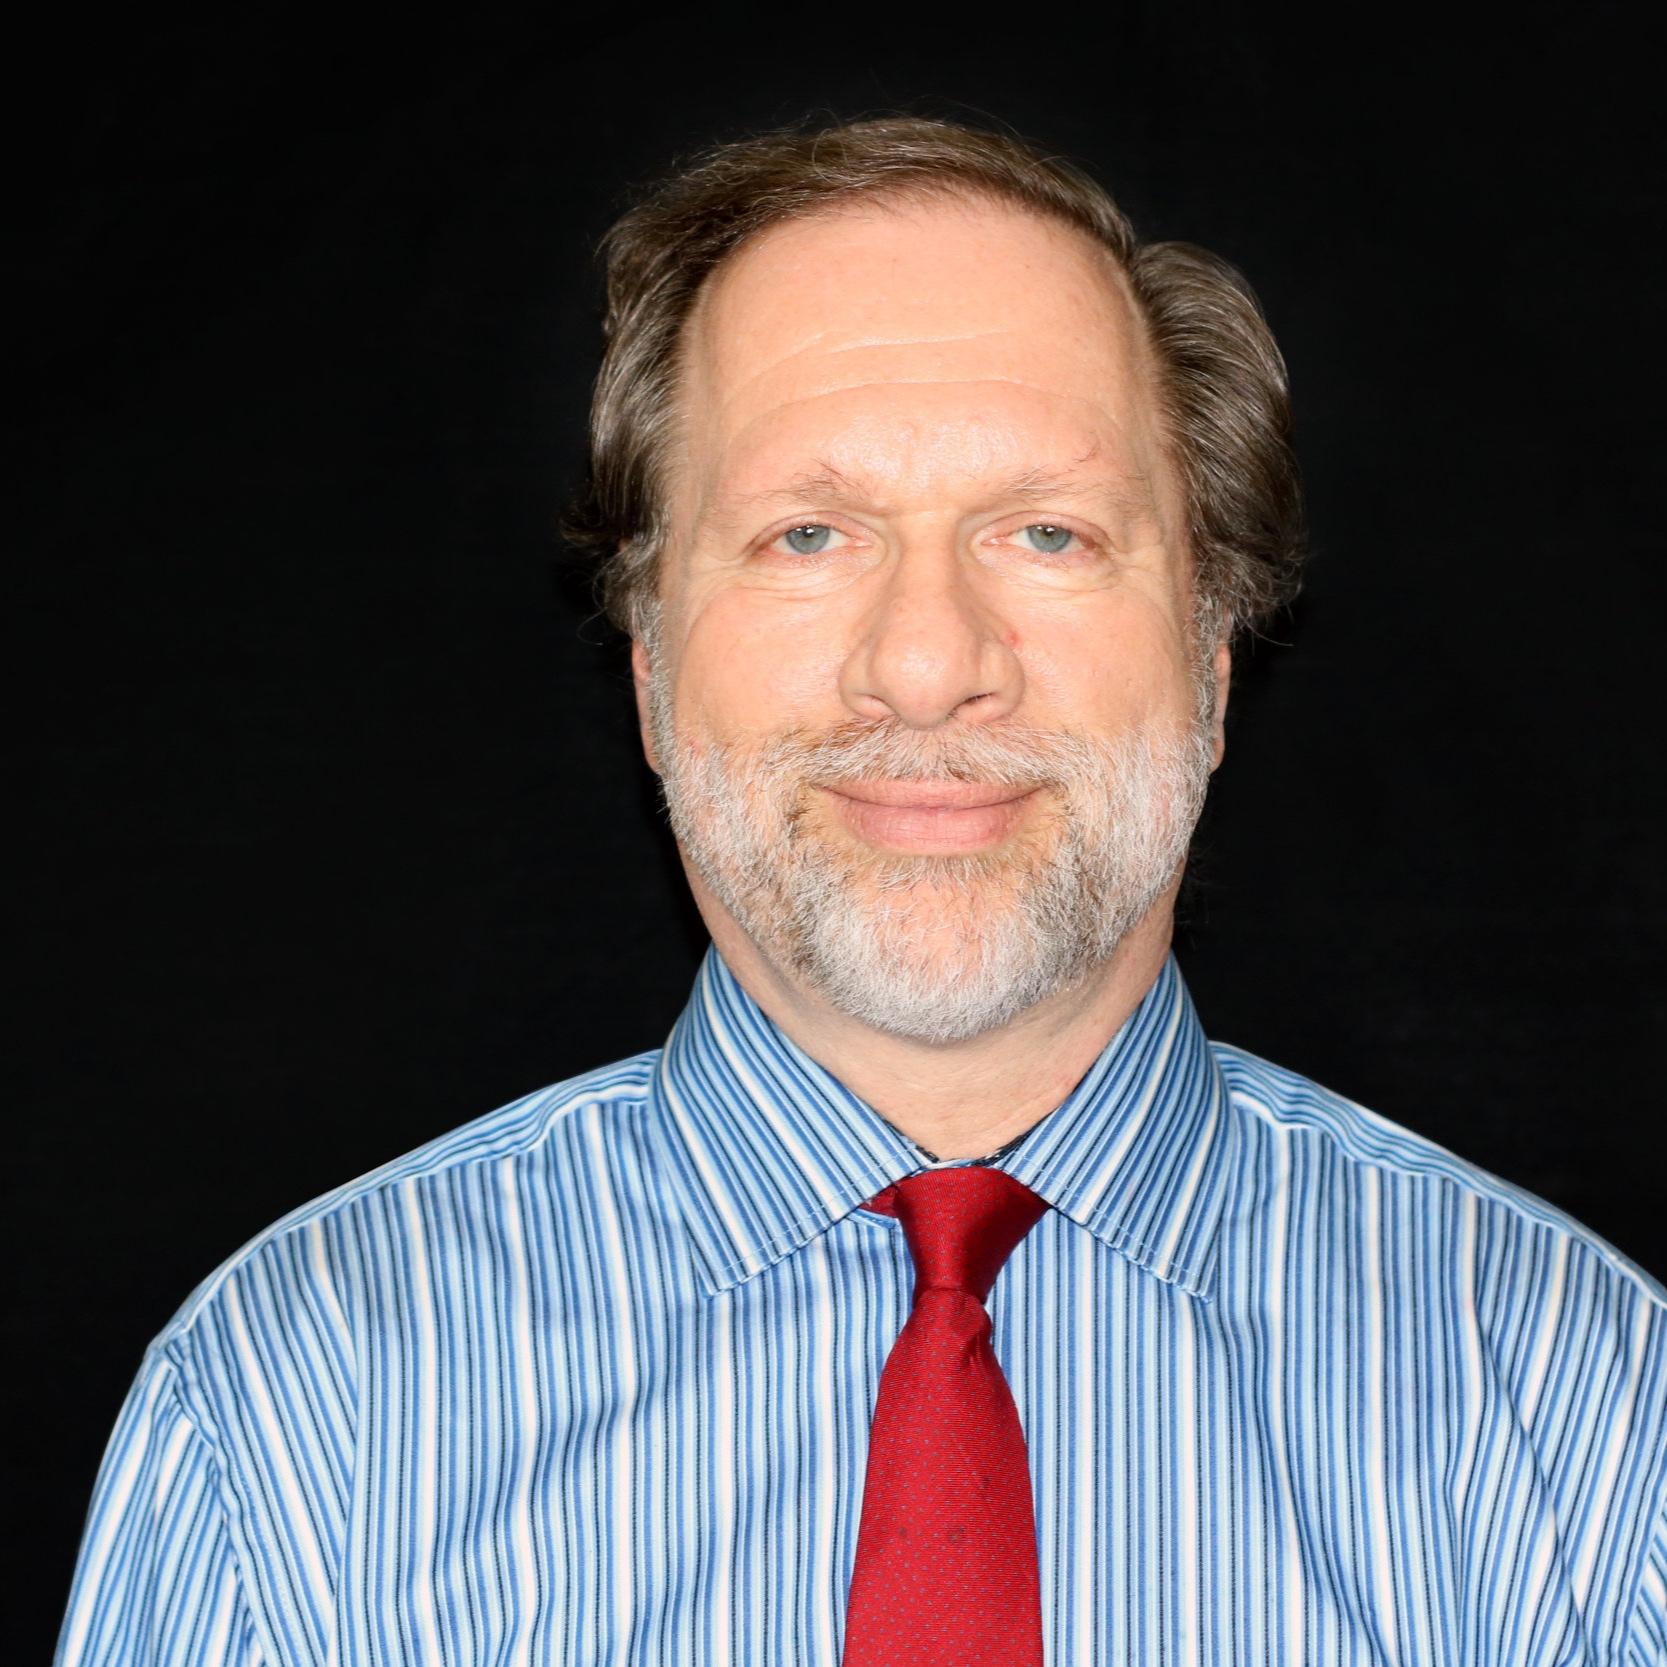 Martin Krongold - VP / COOProgram Operations